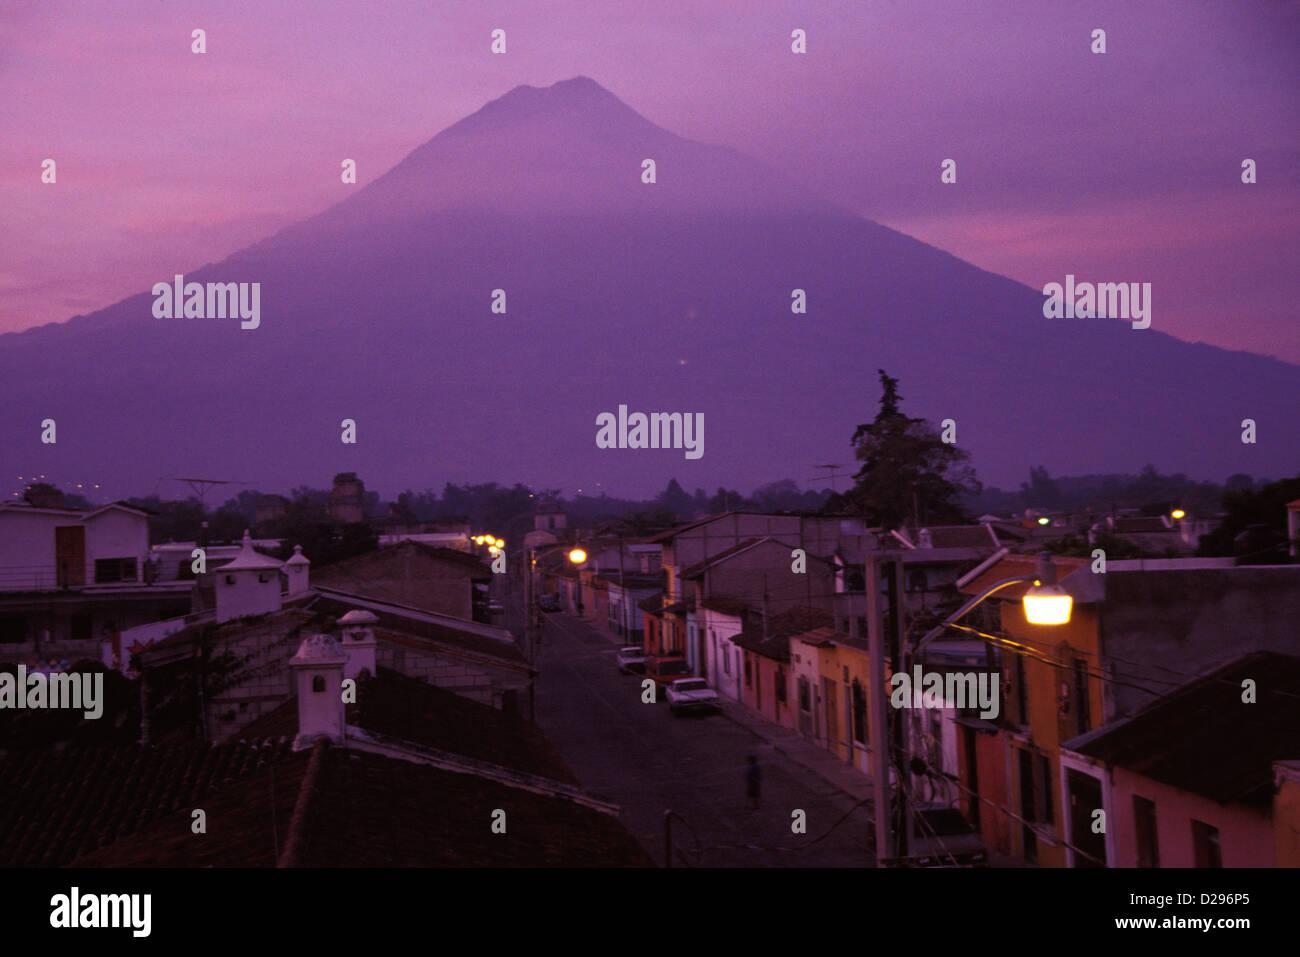 Guatemala, Antigua. Volcan Agua Volcano And Old Capital At Dusk - Stock Image